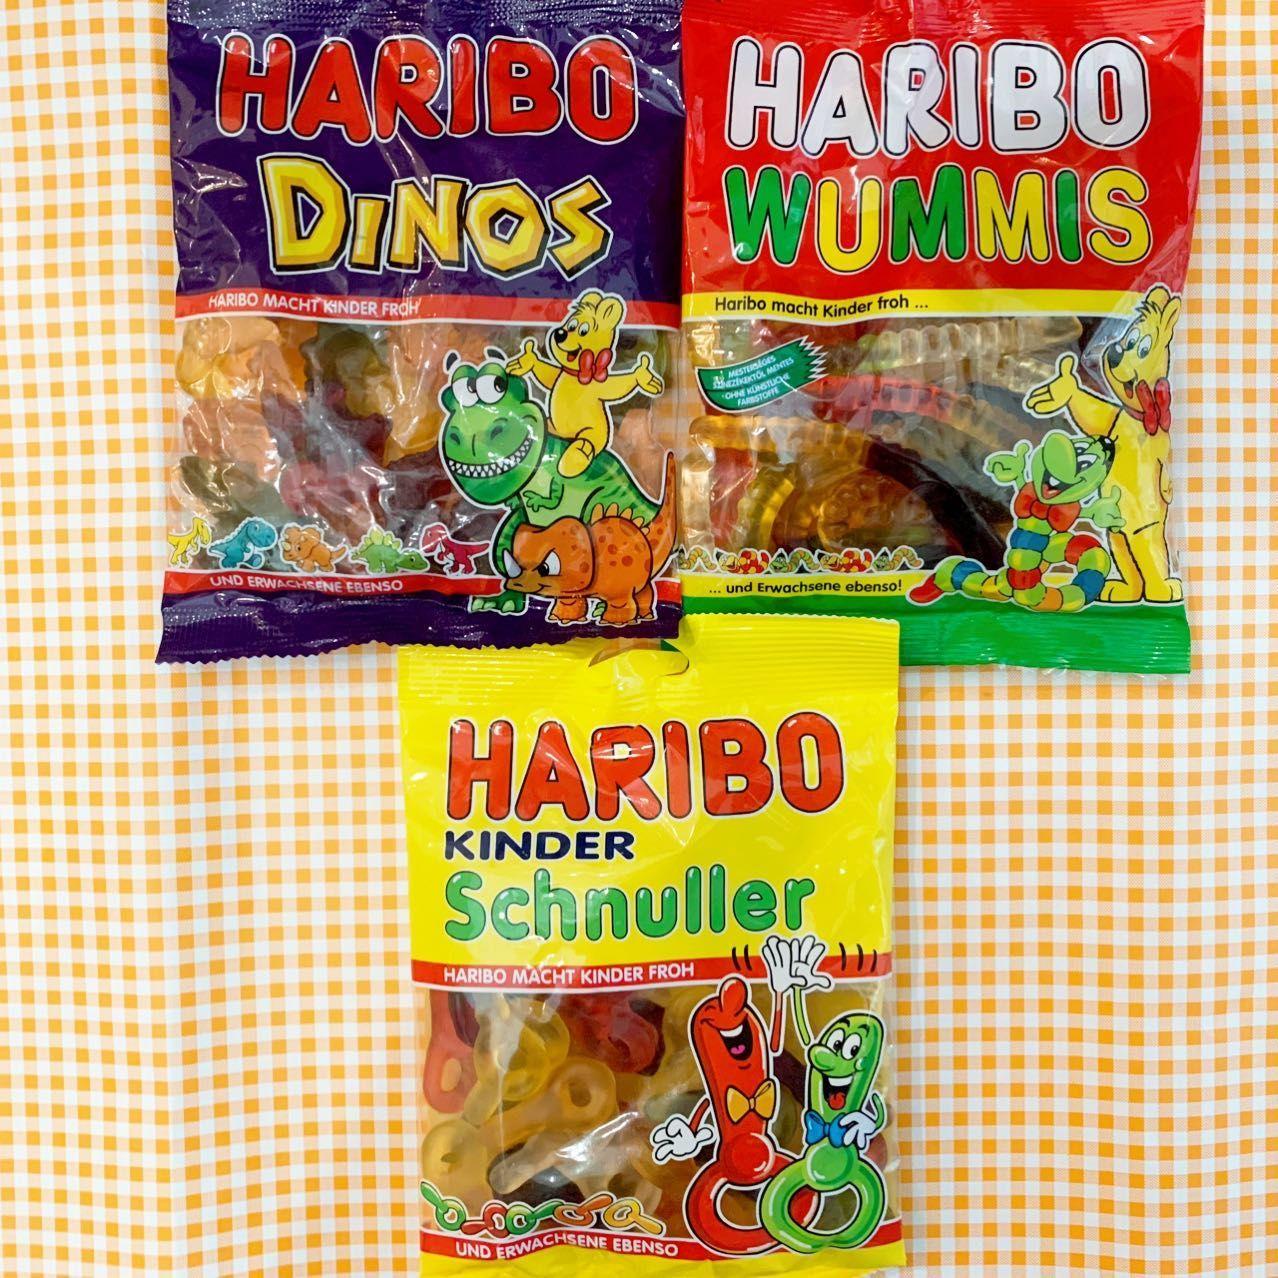 「HARIBO 新商品」の写真